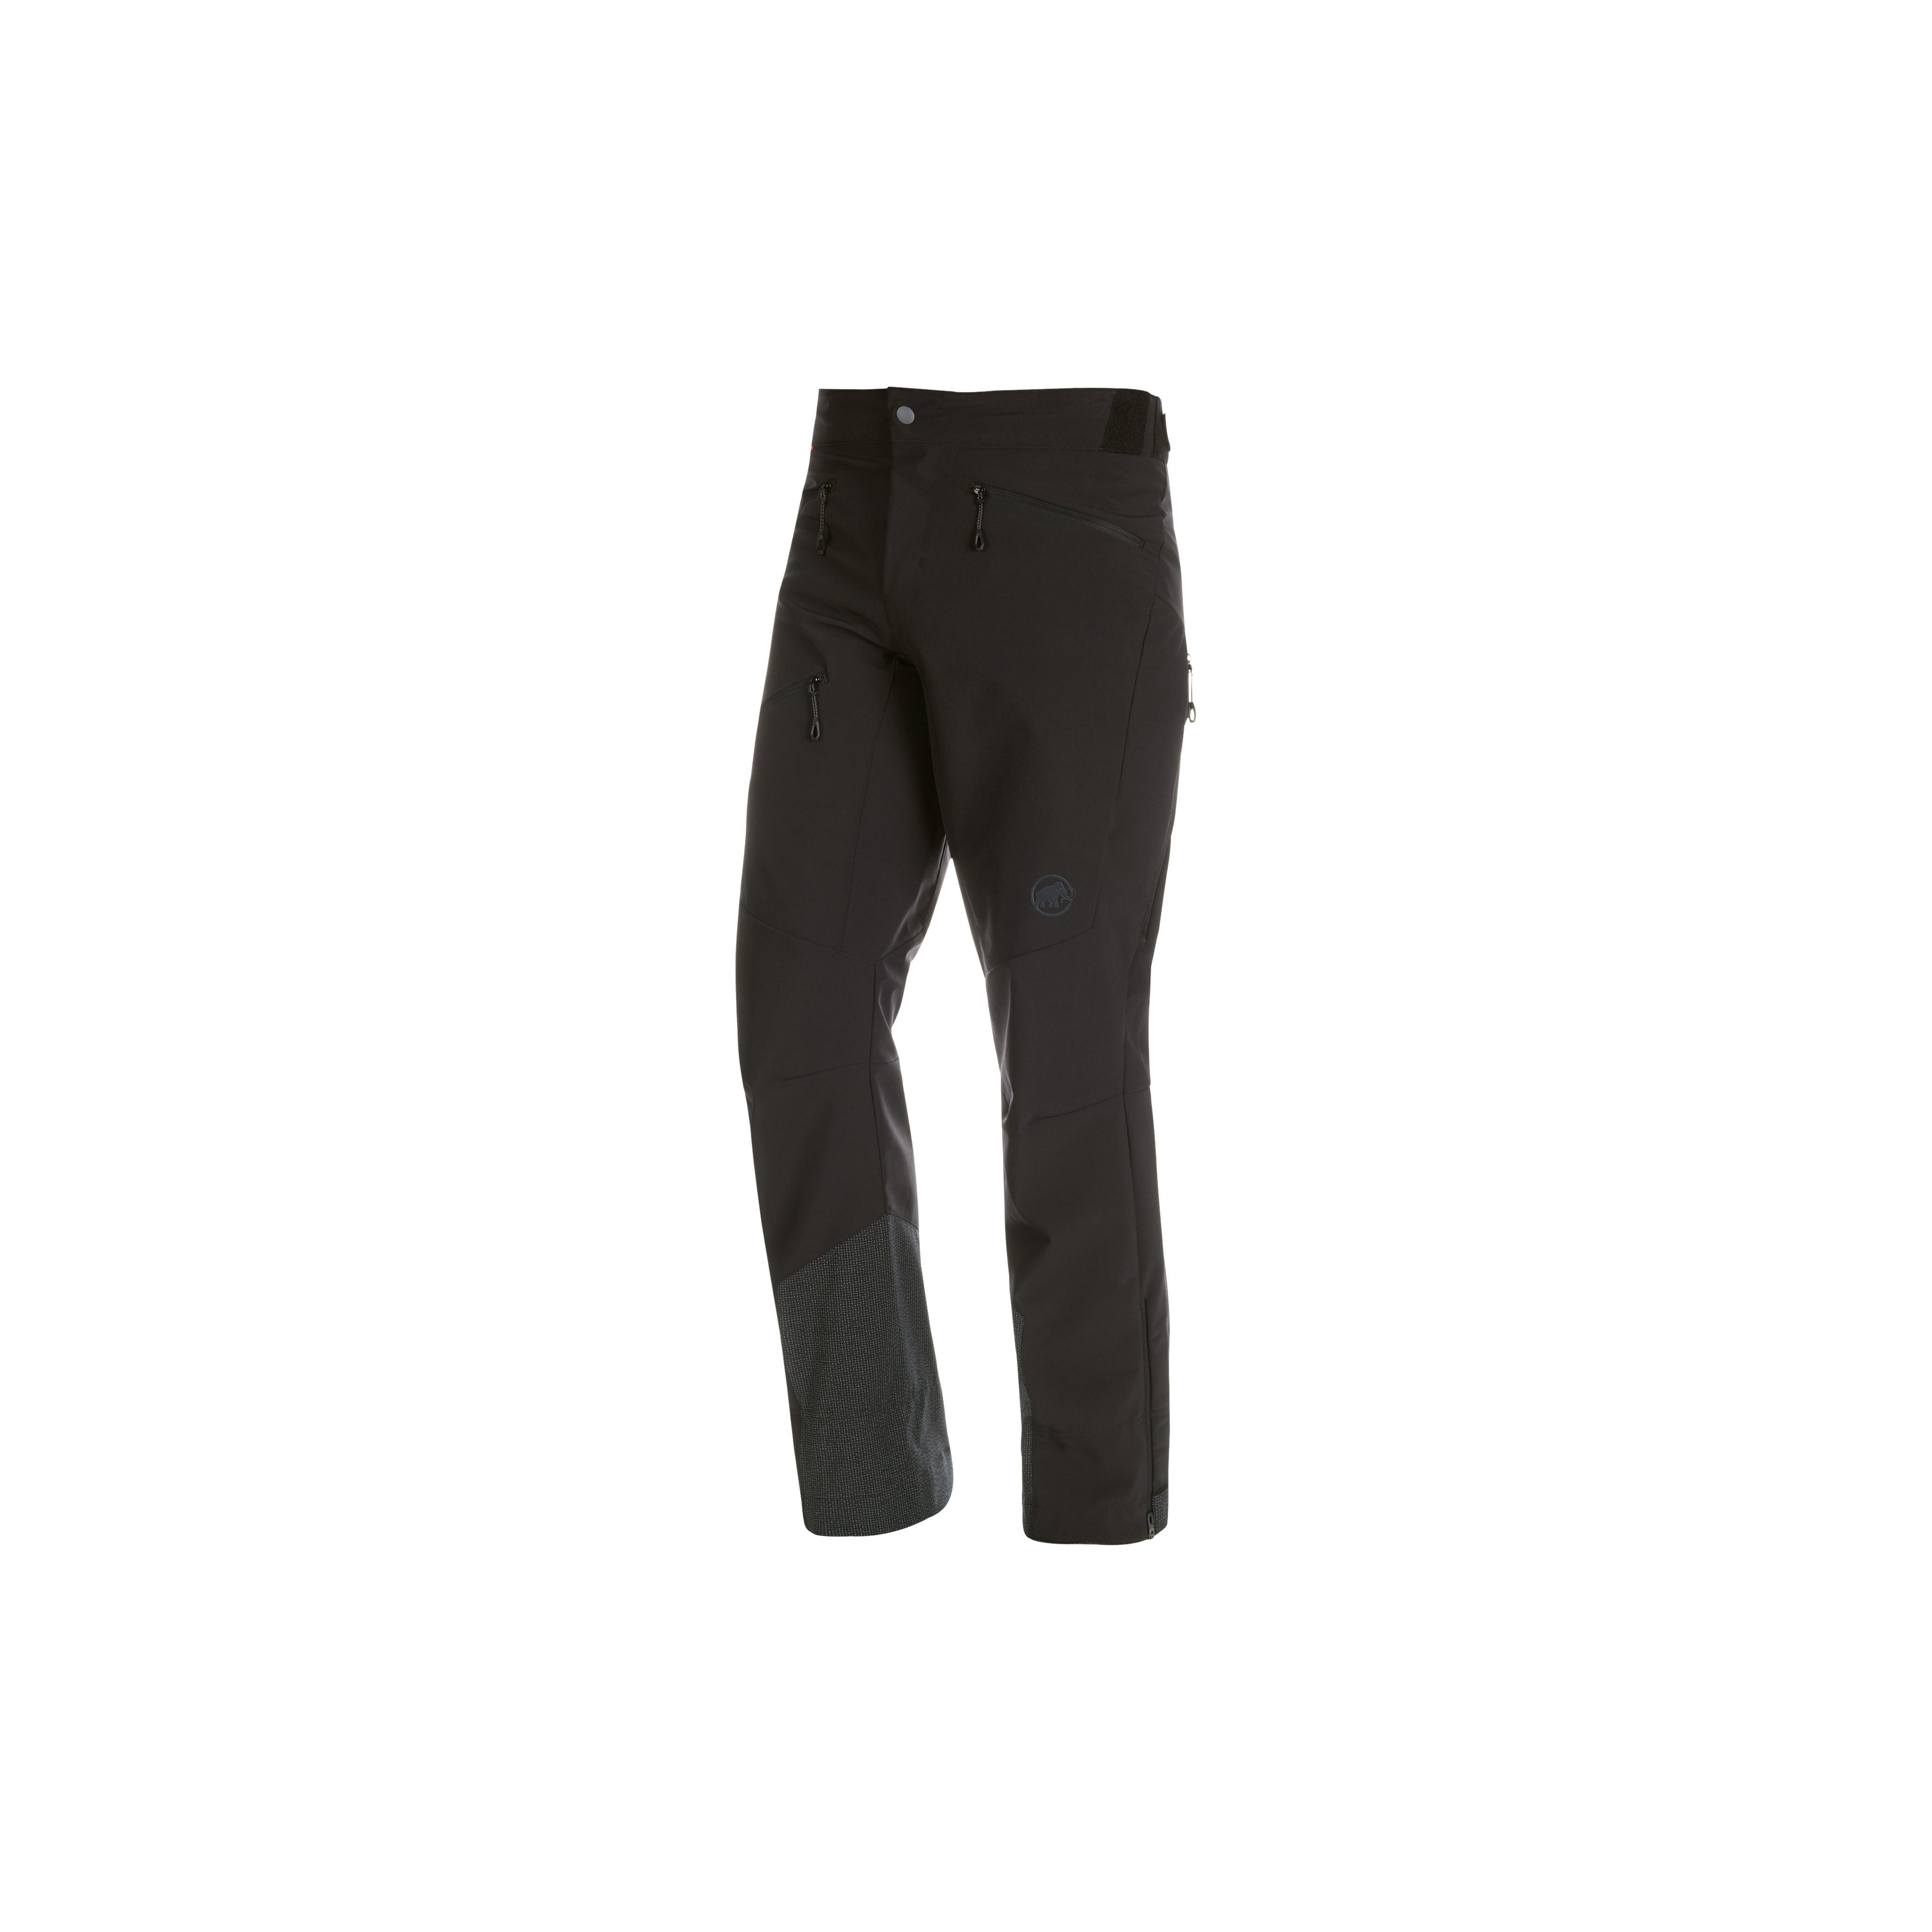 Tatramar SO Pants Men - black, normal, UK 30 thumbnail